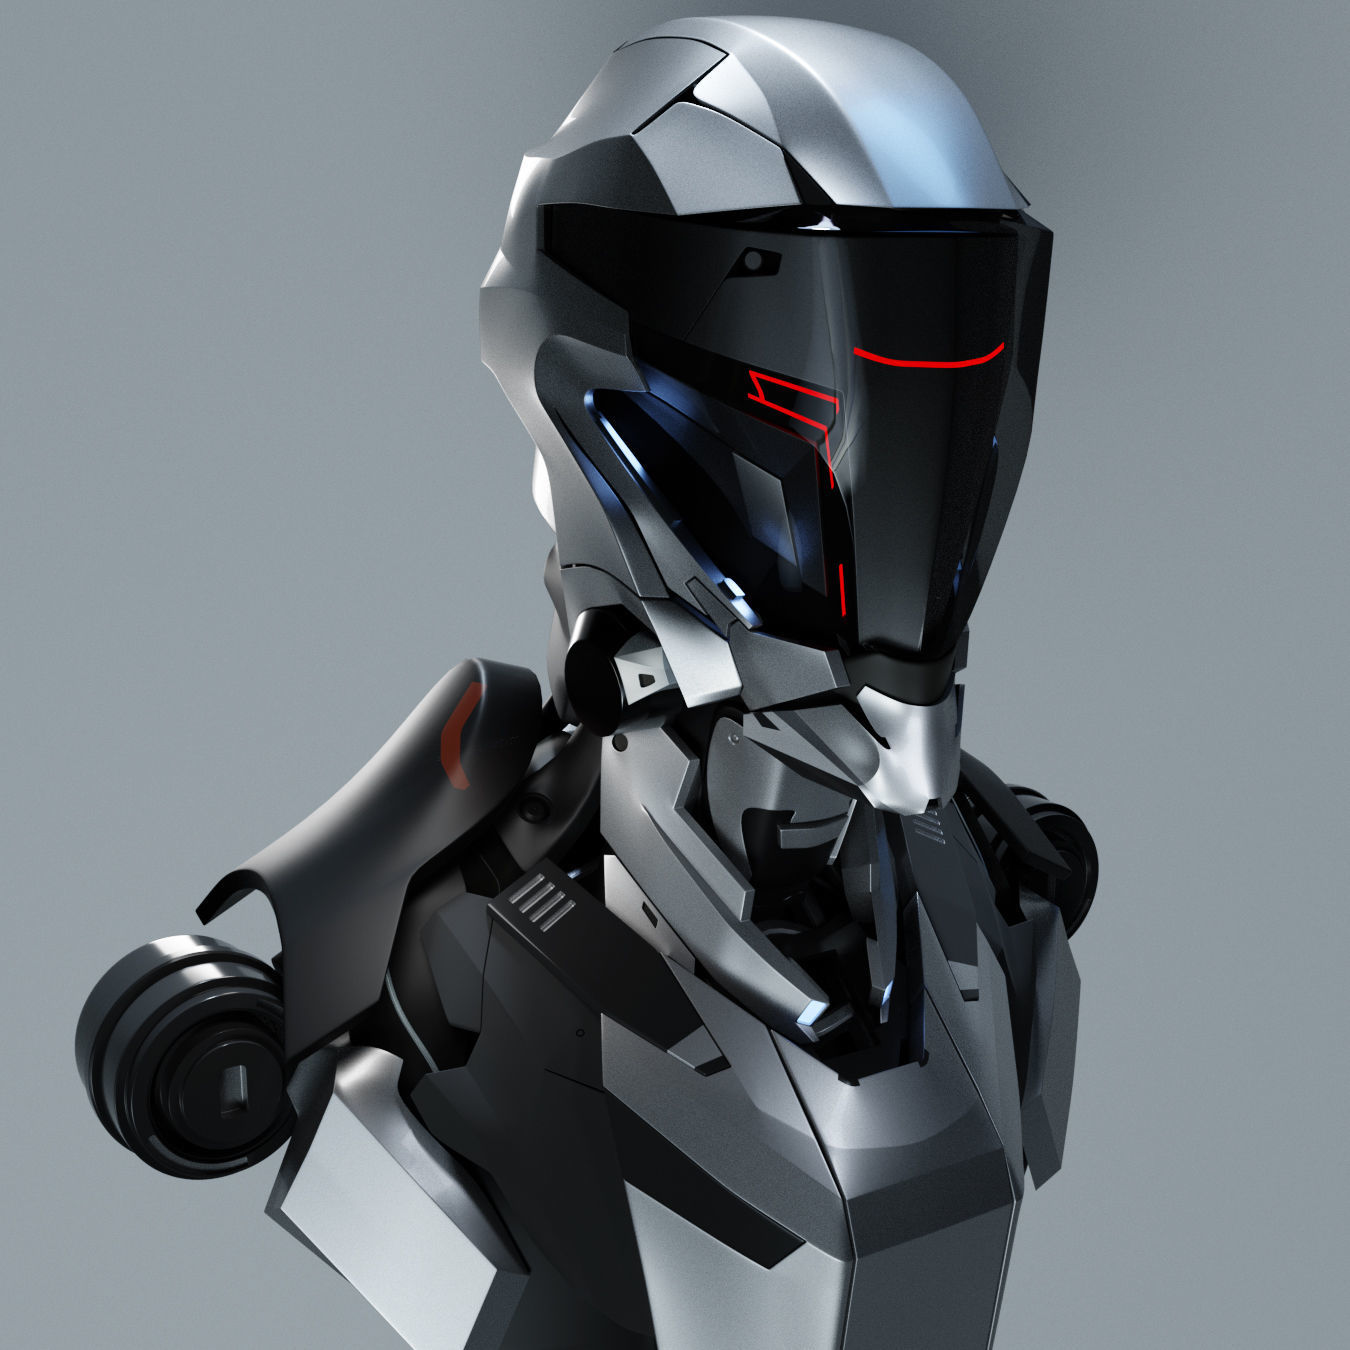 Sci-Fi Male Character 3D Model OBJ ZTL | CGTrader.com